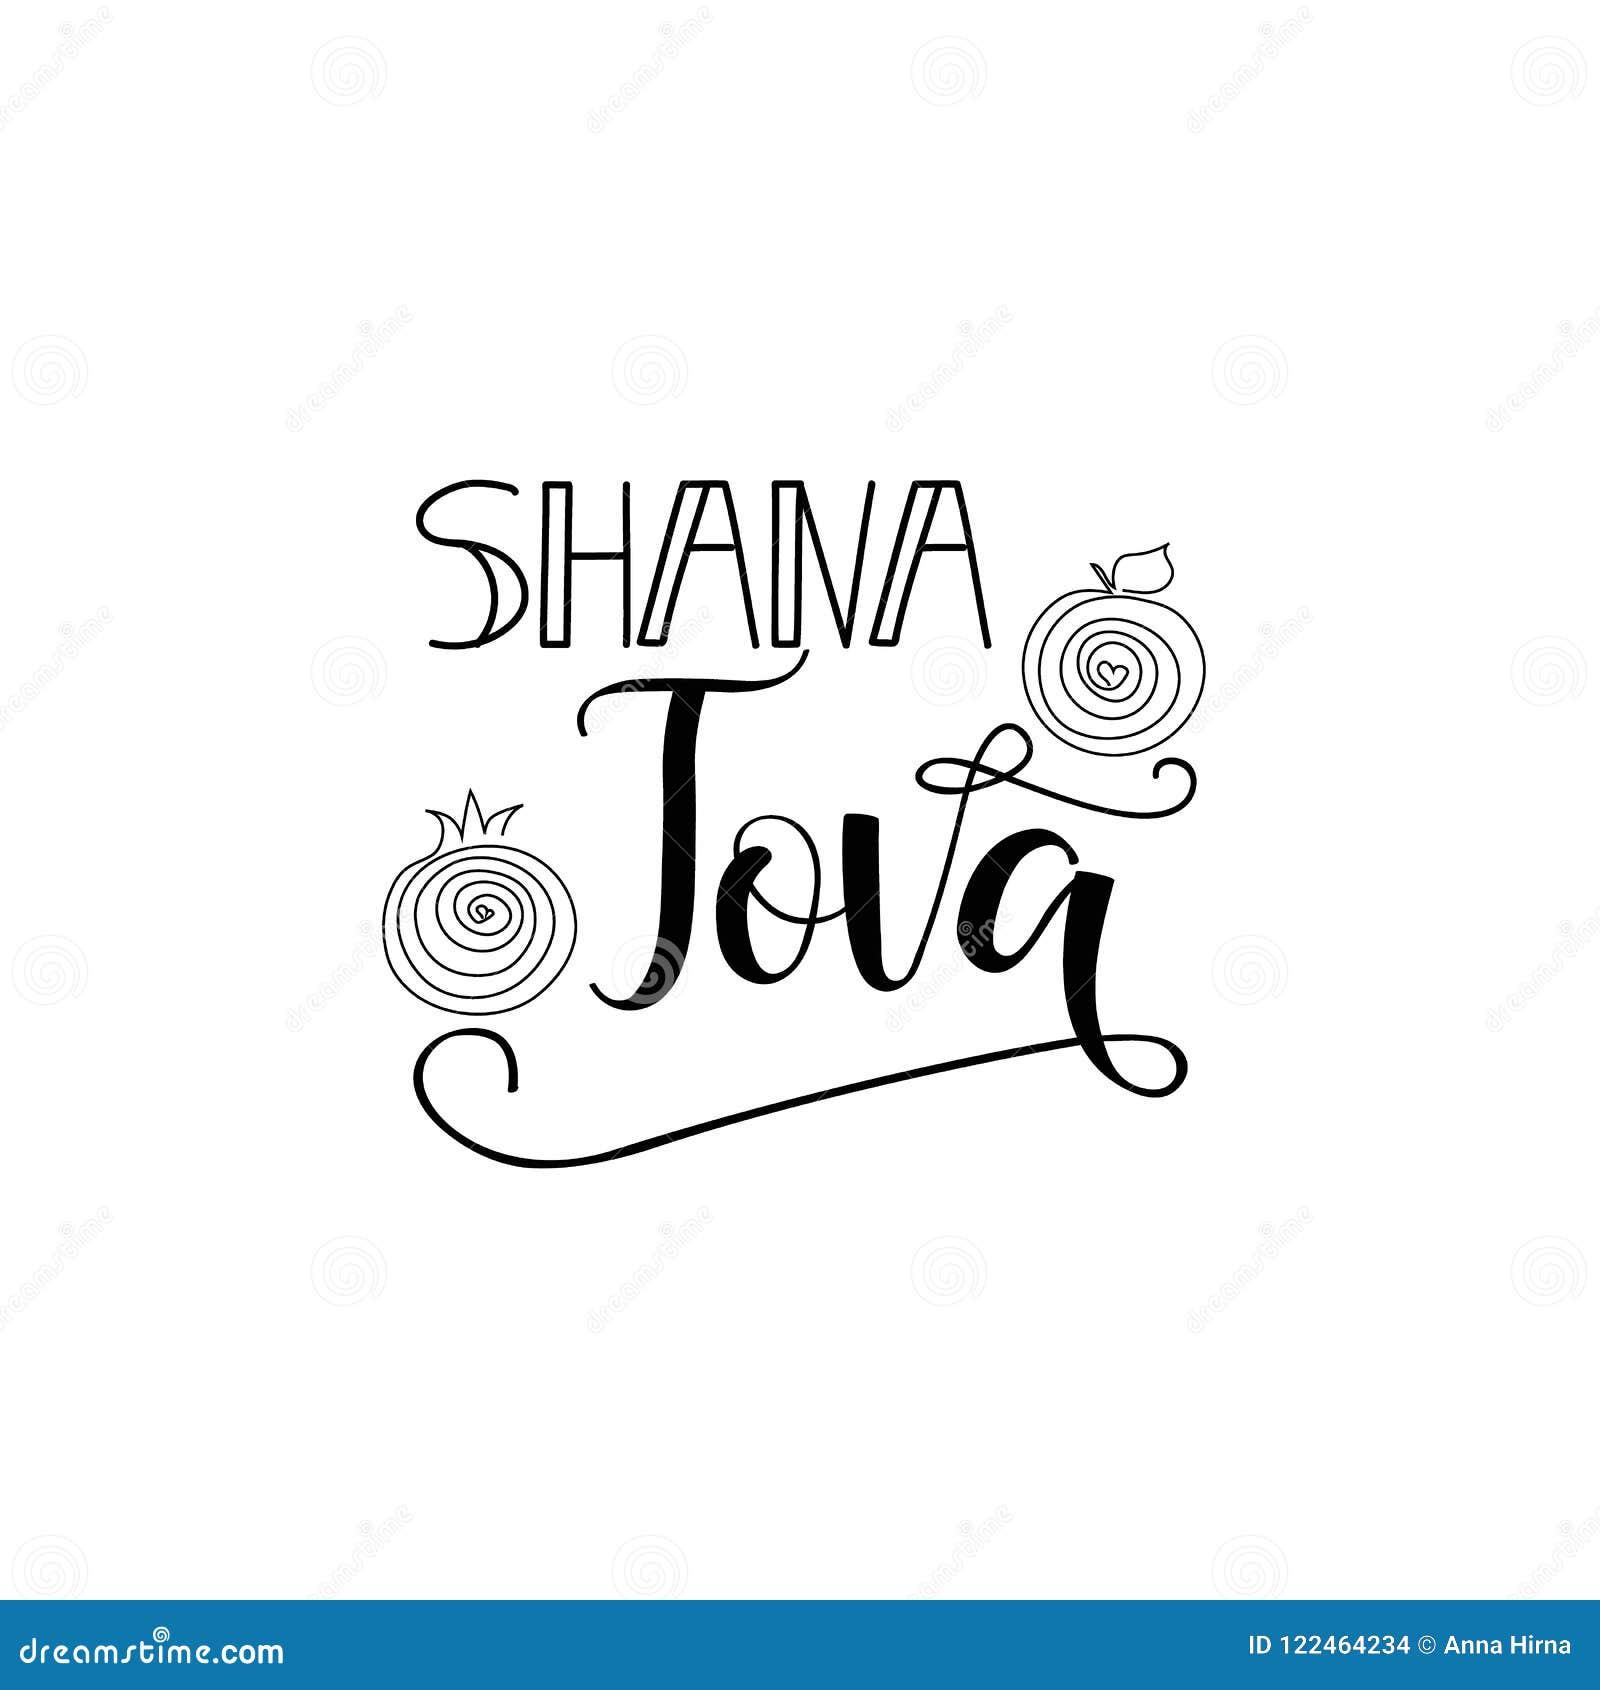 Rosh hashanah jewish new year greeting card text shana tova download comp m4hsunfo